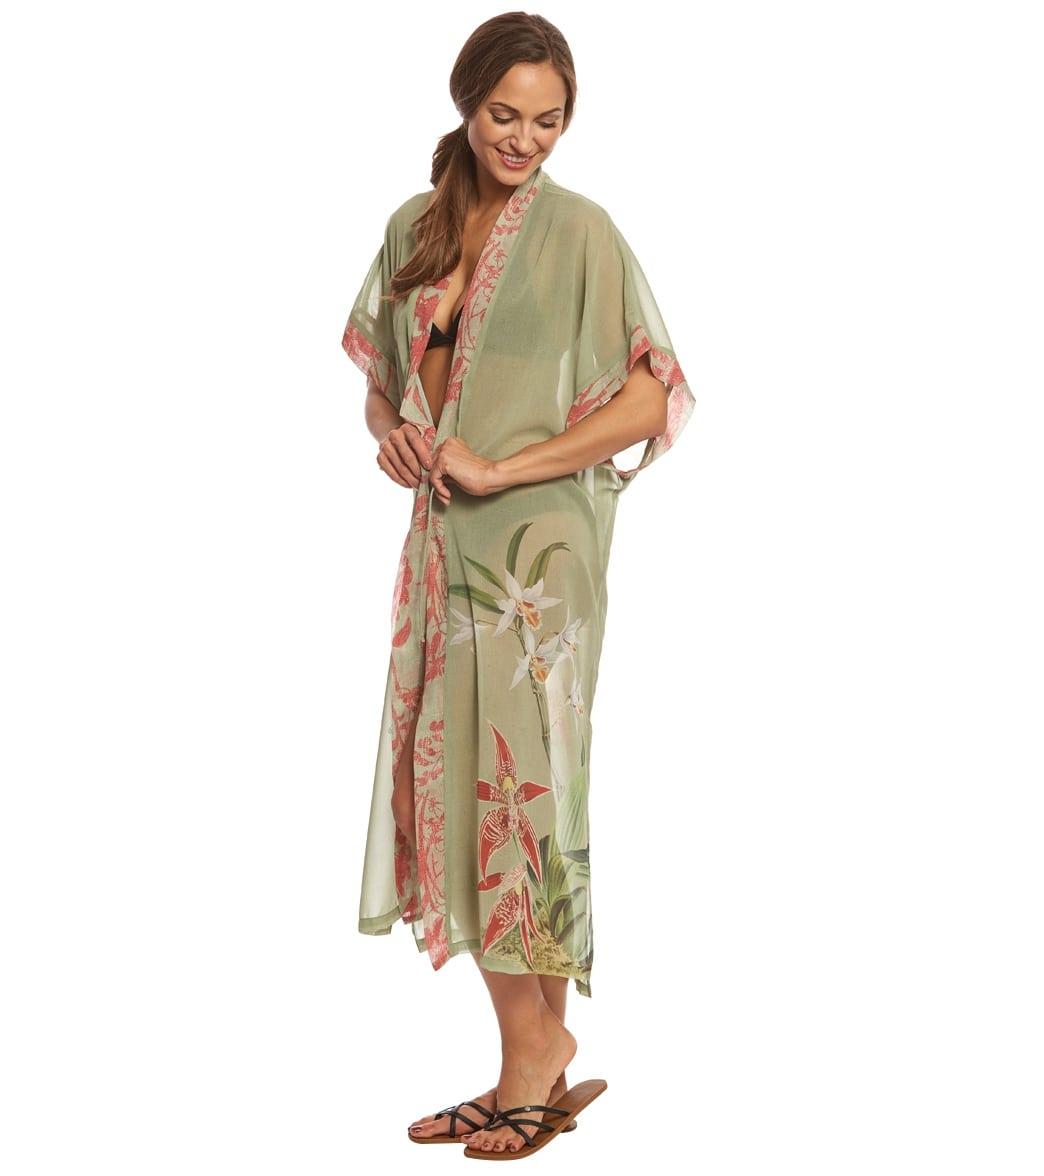 aad4a4f8551ac Rappi Retro Hawaiian Kimono at SwimOutlet.com - Free Shipping